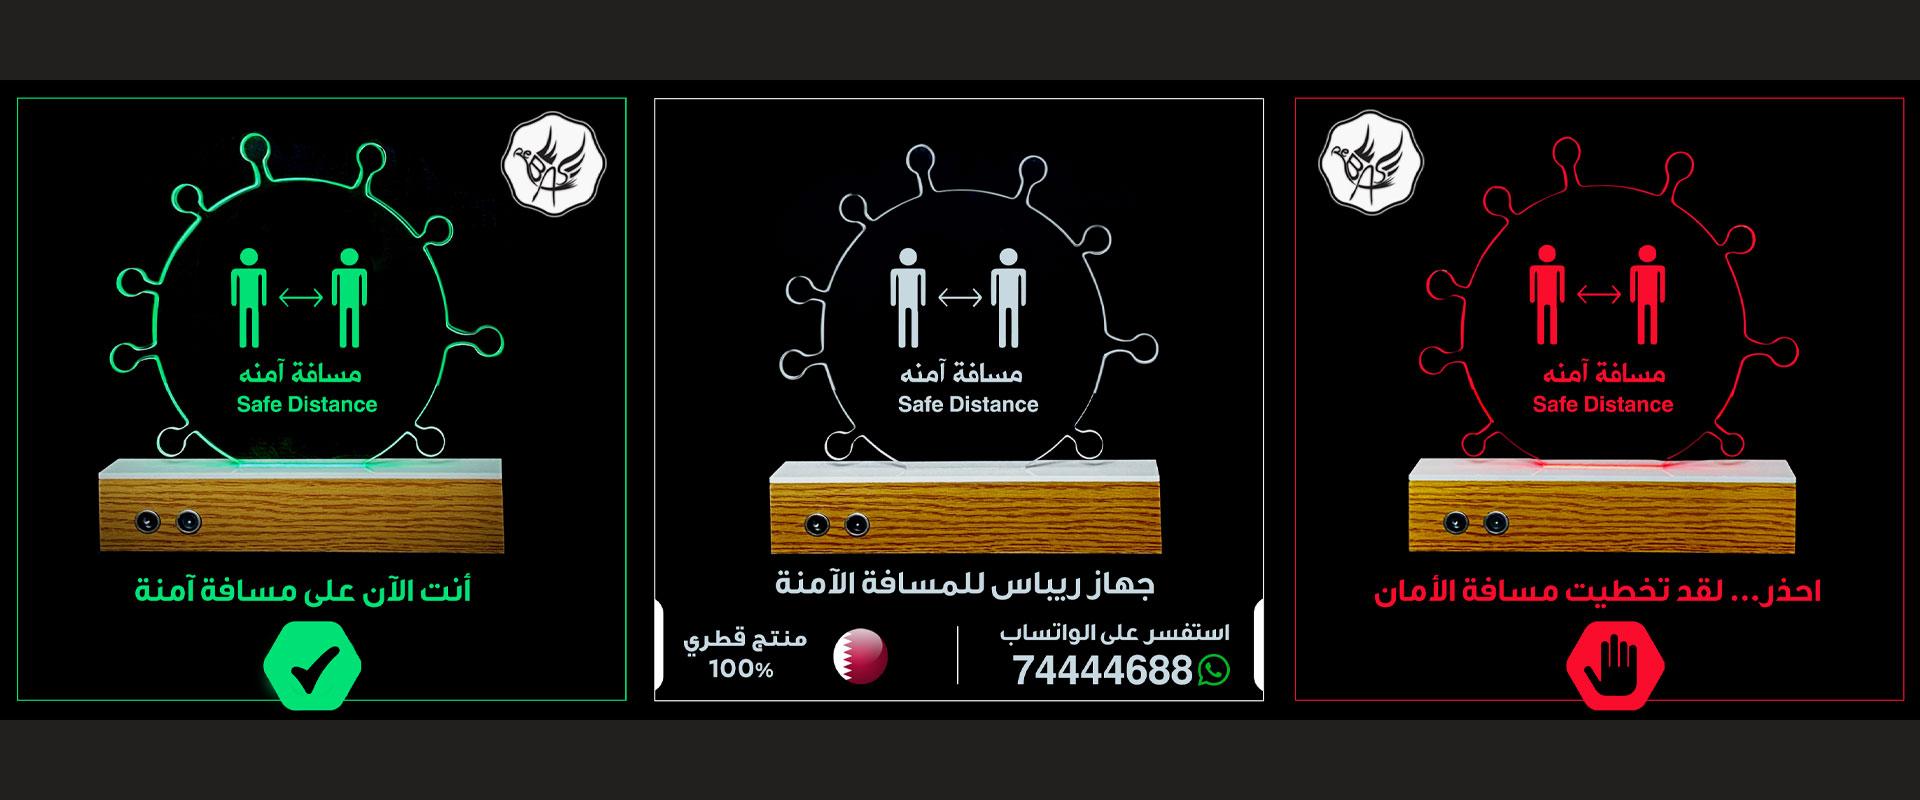 REBAS Safe Distance Device 100% Qatari product جهاز ريباس للمسافة الآمنة ١٠٠٪ منتج قطري